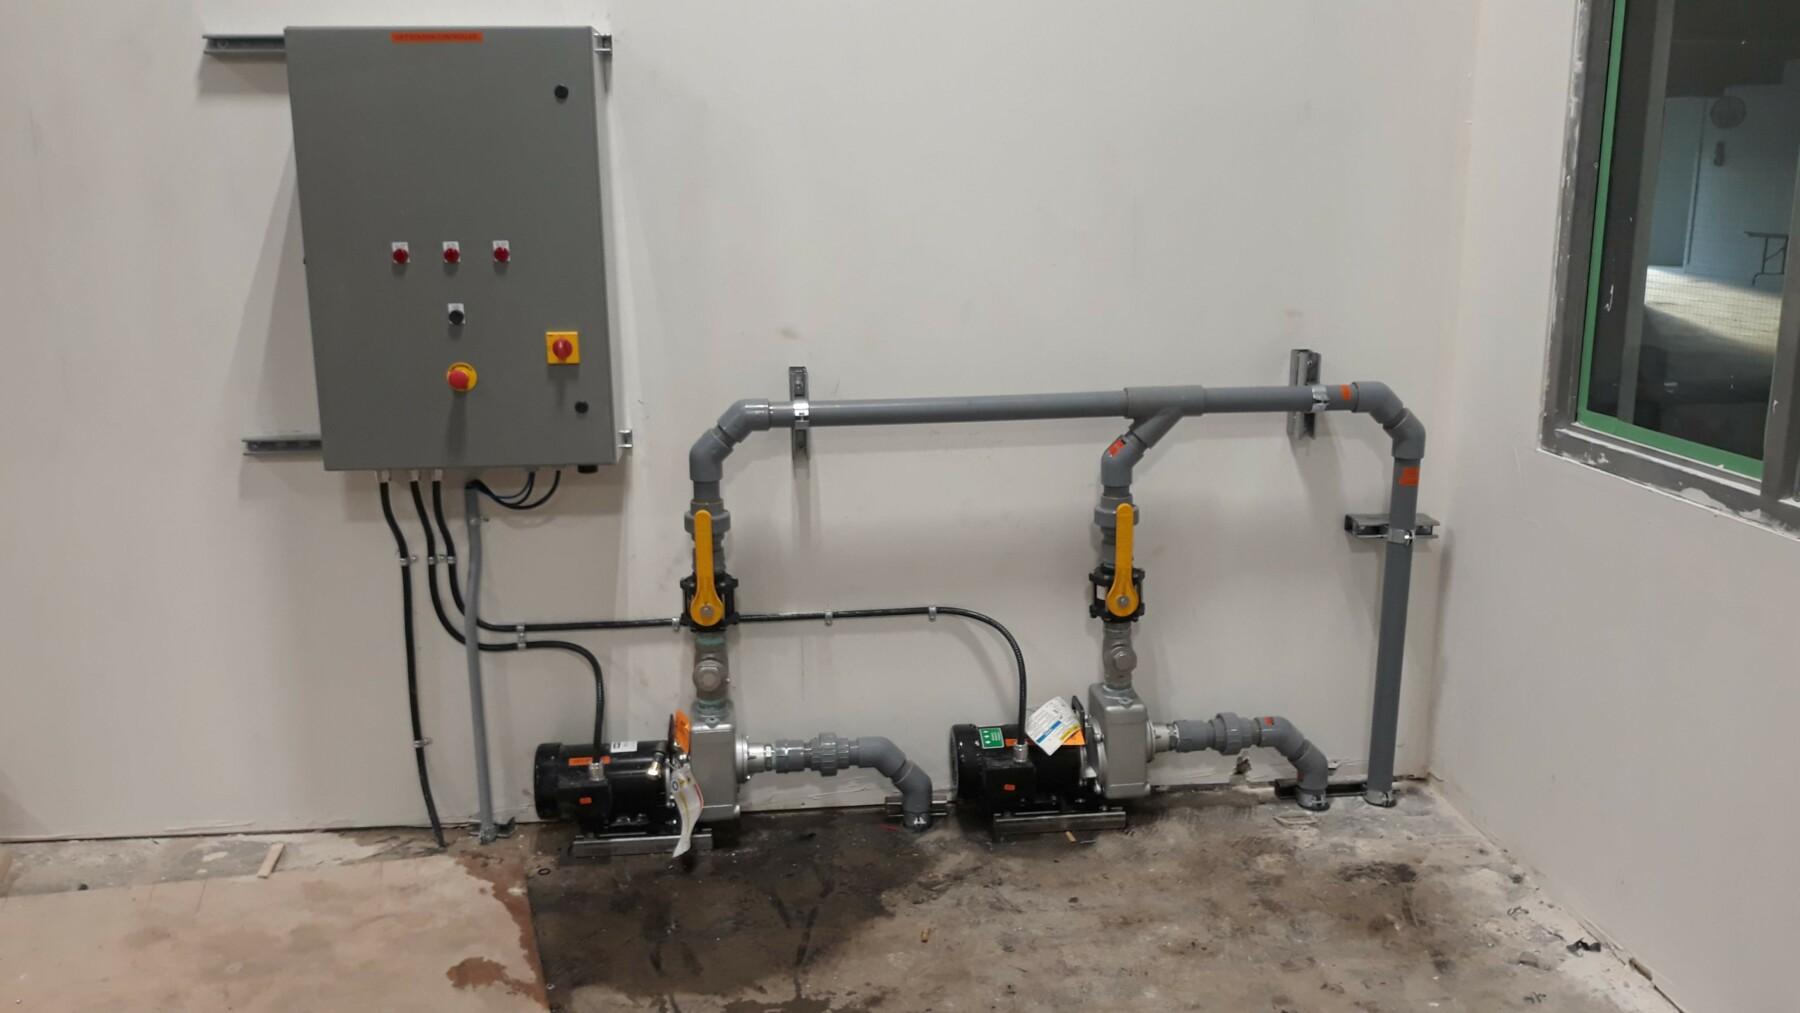 Duplex pump system